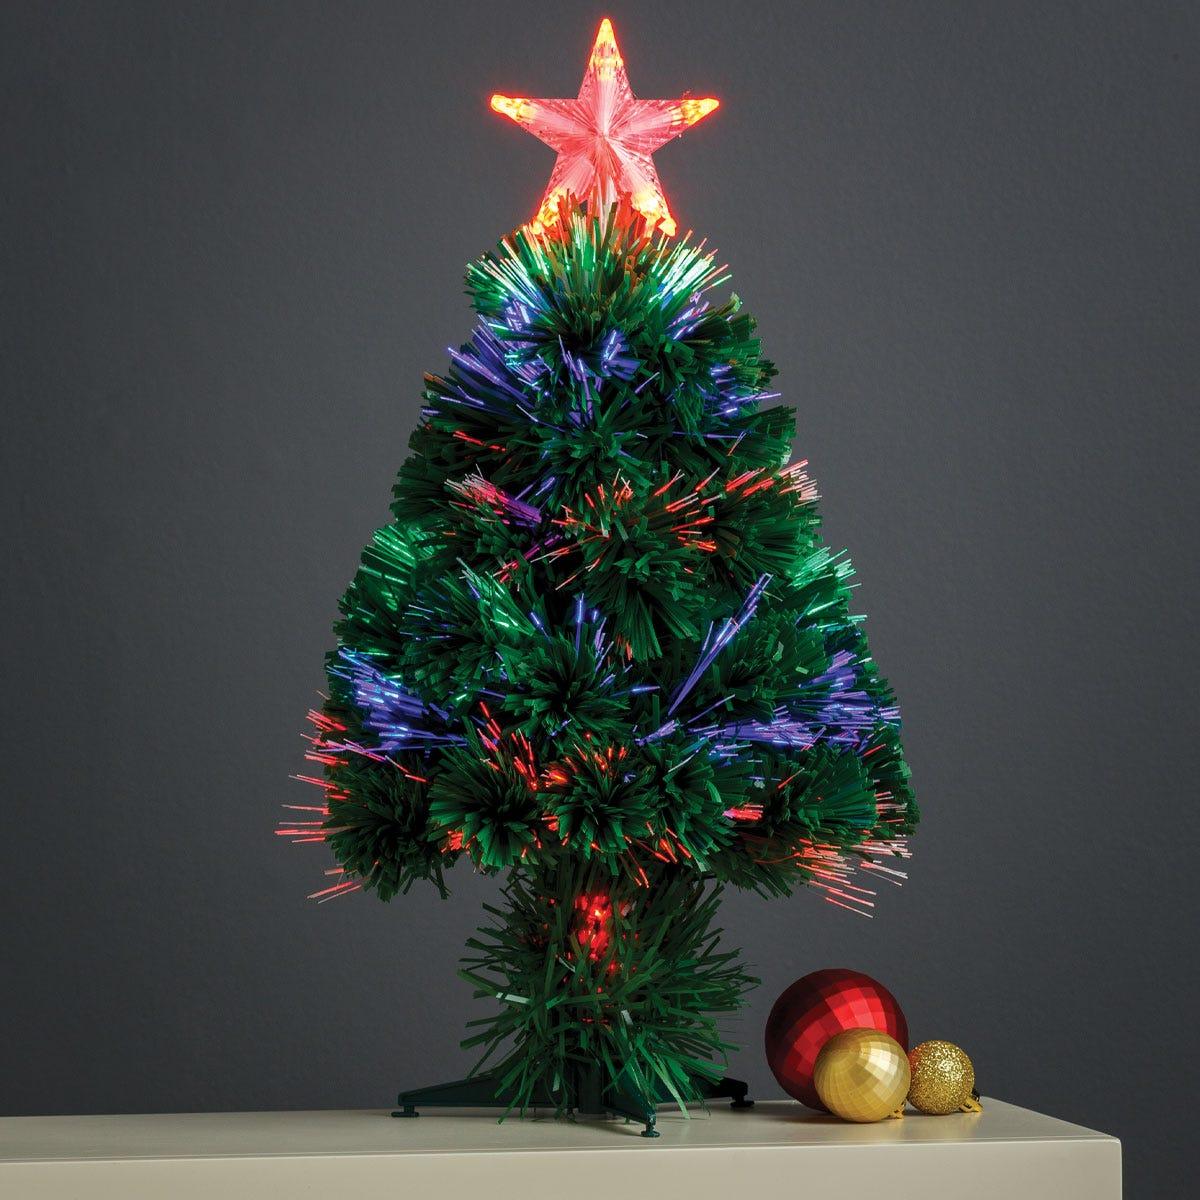 1.5ft Robert Dyas Penrith Fibre Optic Christmas Tree with Star